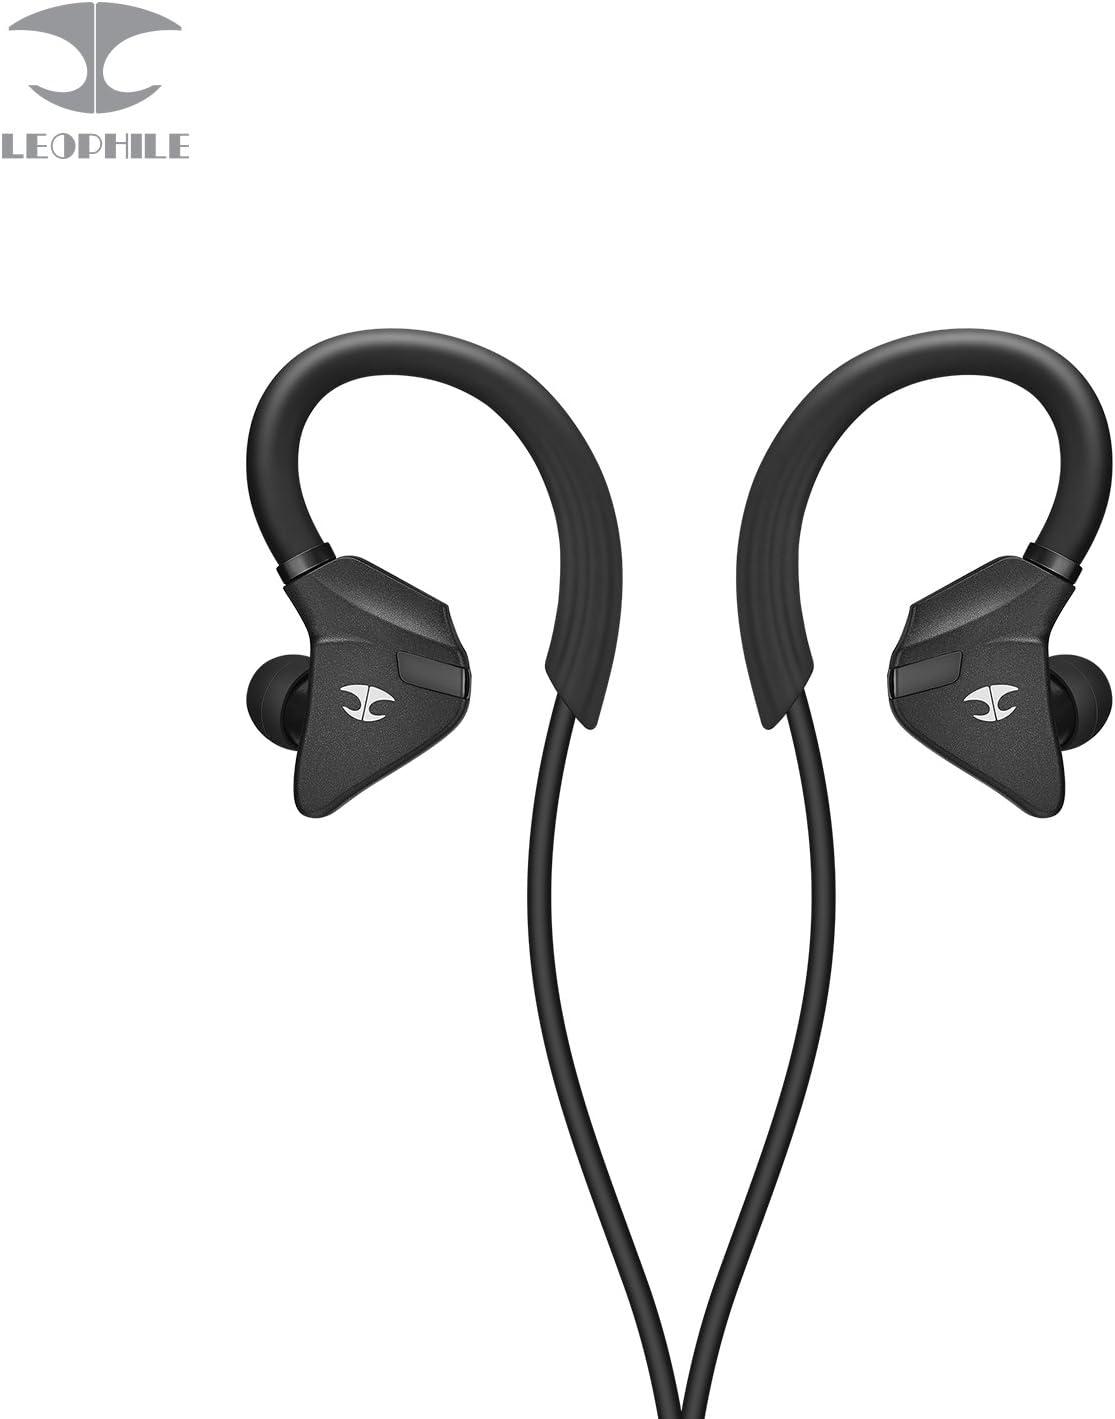 LEOPHILE Impulse Cuffie Bluetooth Sport, IPX5 Impermeabili